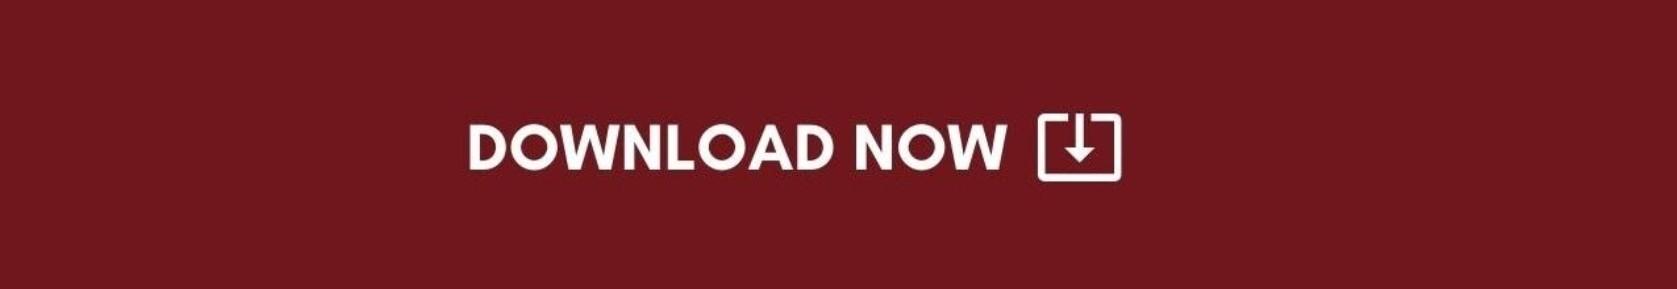 Hitman 3 Free Download on Playstation 4, 5, Xbox Upgrade, Preorder, Steam, Trailer – FilmyOne.com